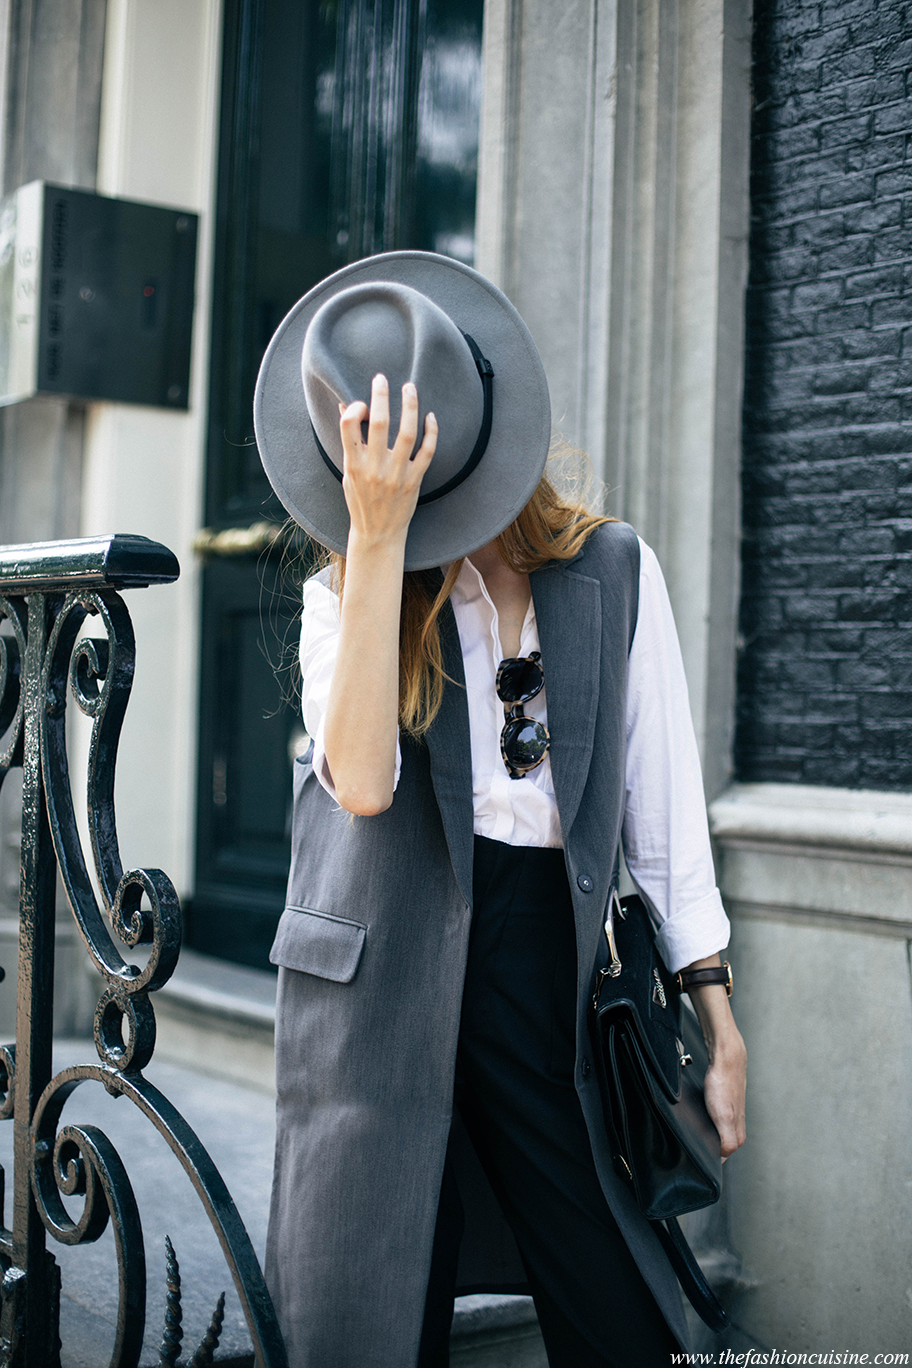 Beatrice_Gutu_灰色针织衫半身开衩裙黑色运动鞋手提包3.jpg